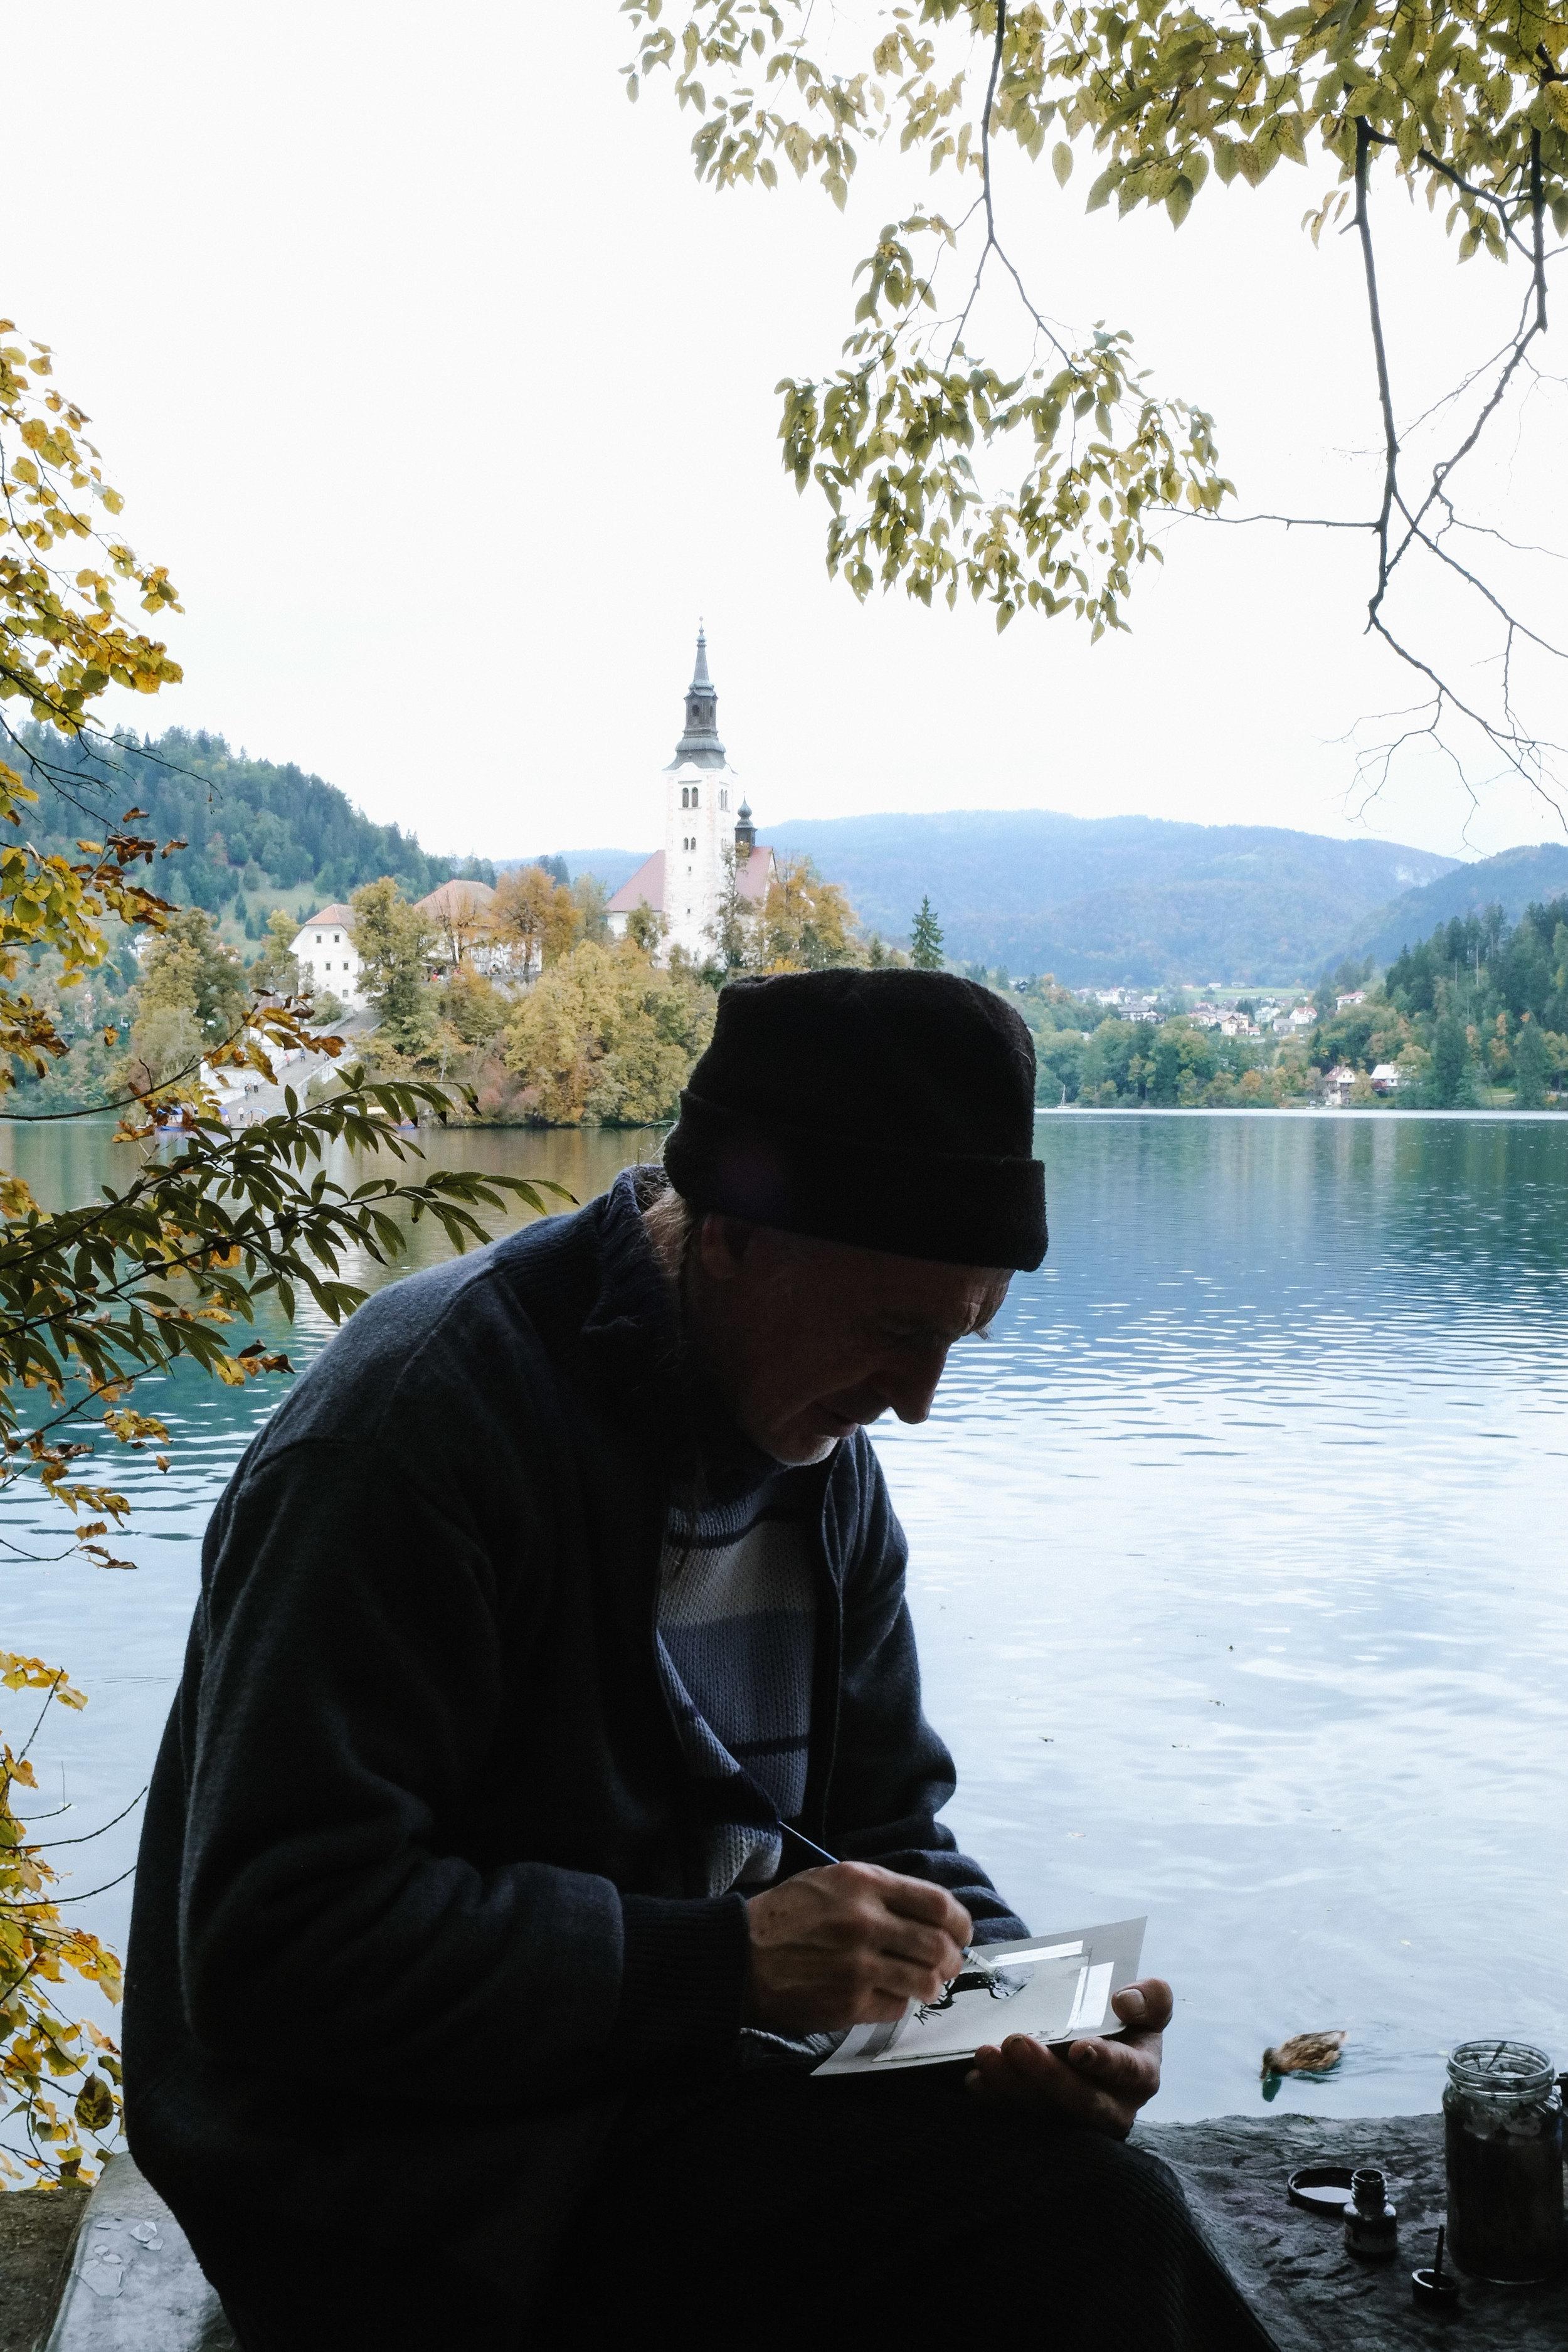 Slovenia_Bled_Lesly Lotha 07.jpg